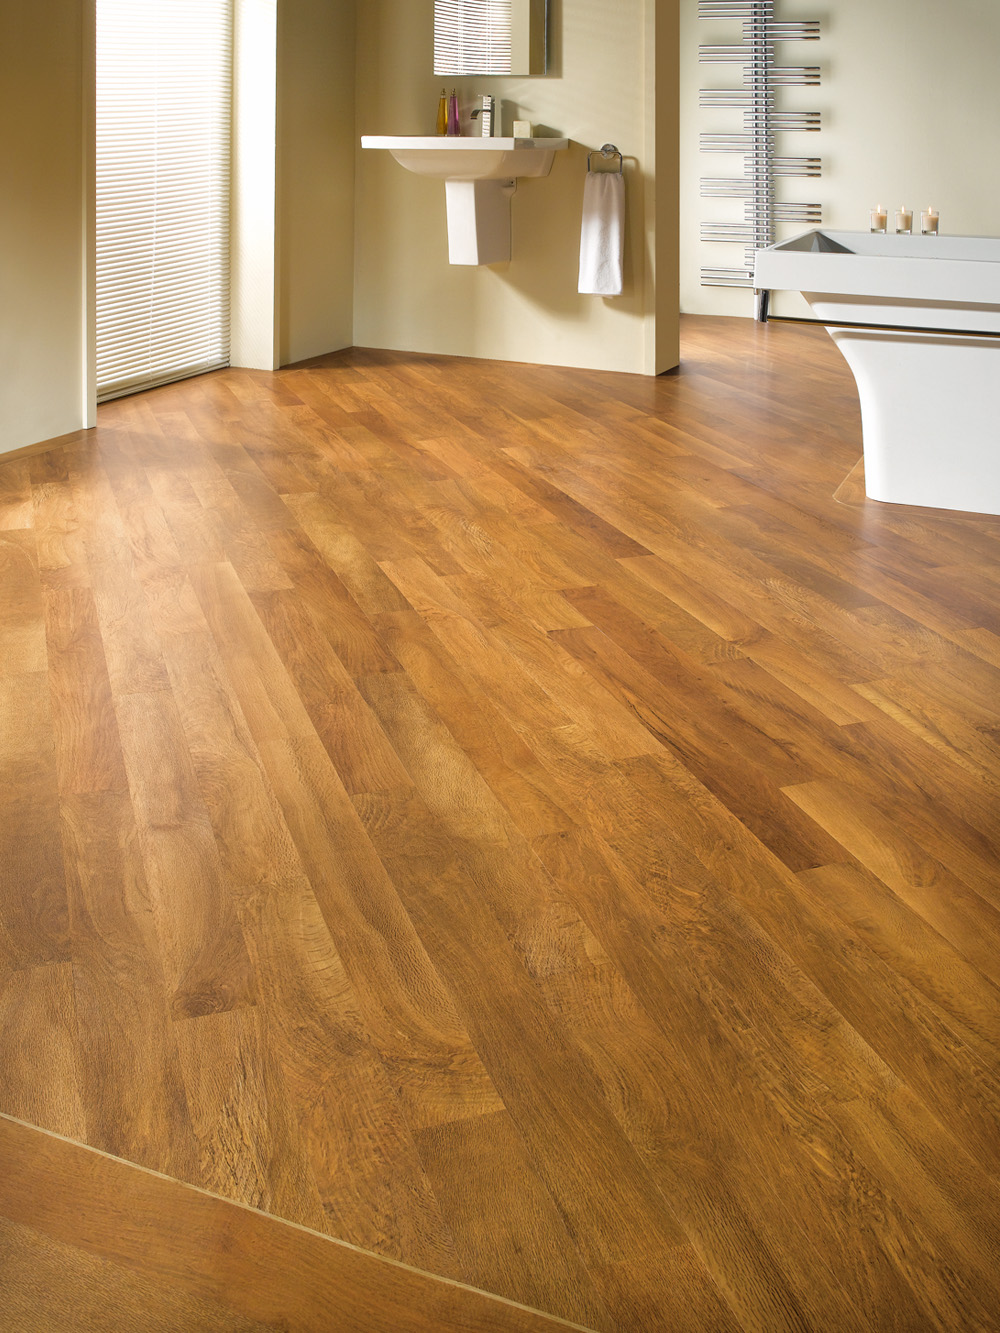 Online Carpets Uk >> Karndean In Bathrooms - Homecraft Carpets